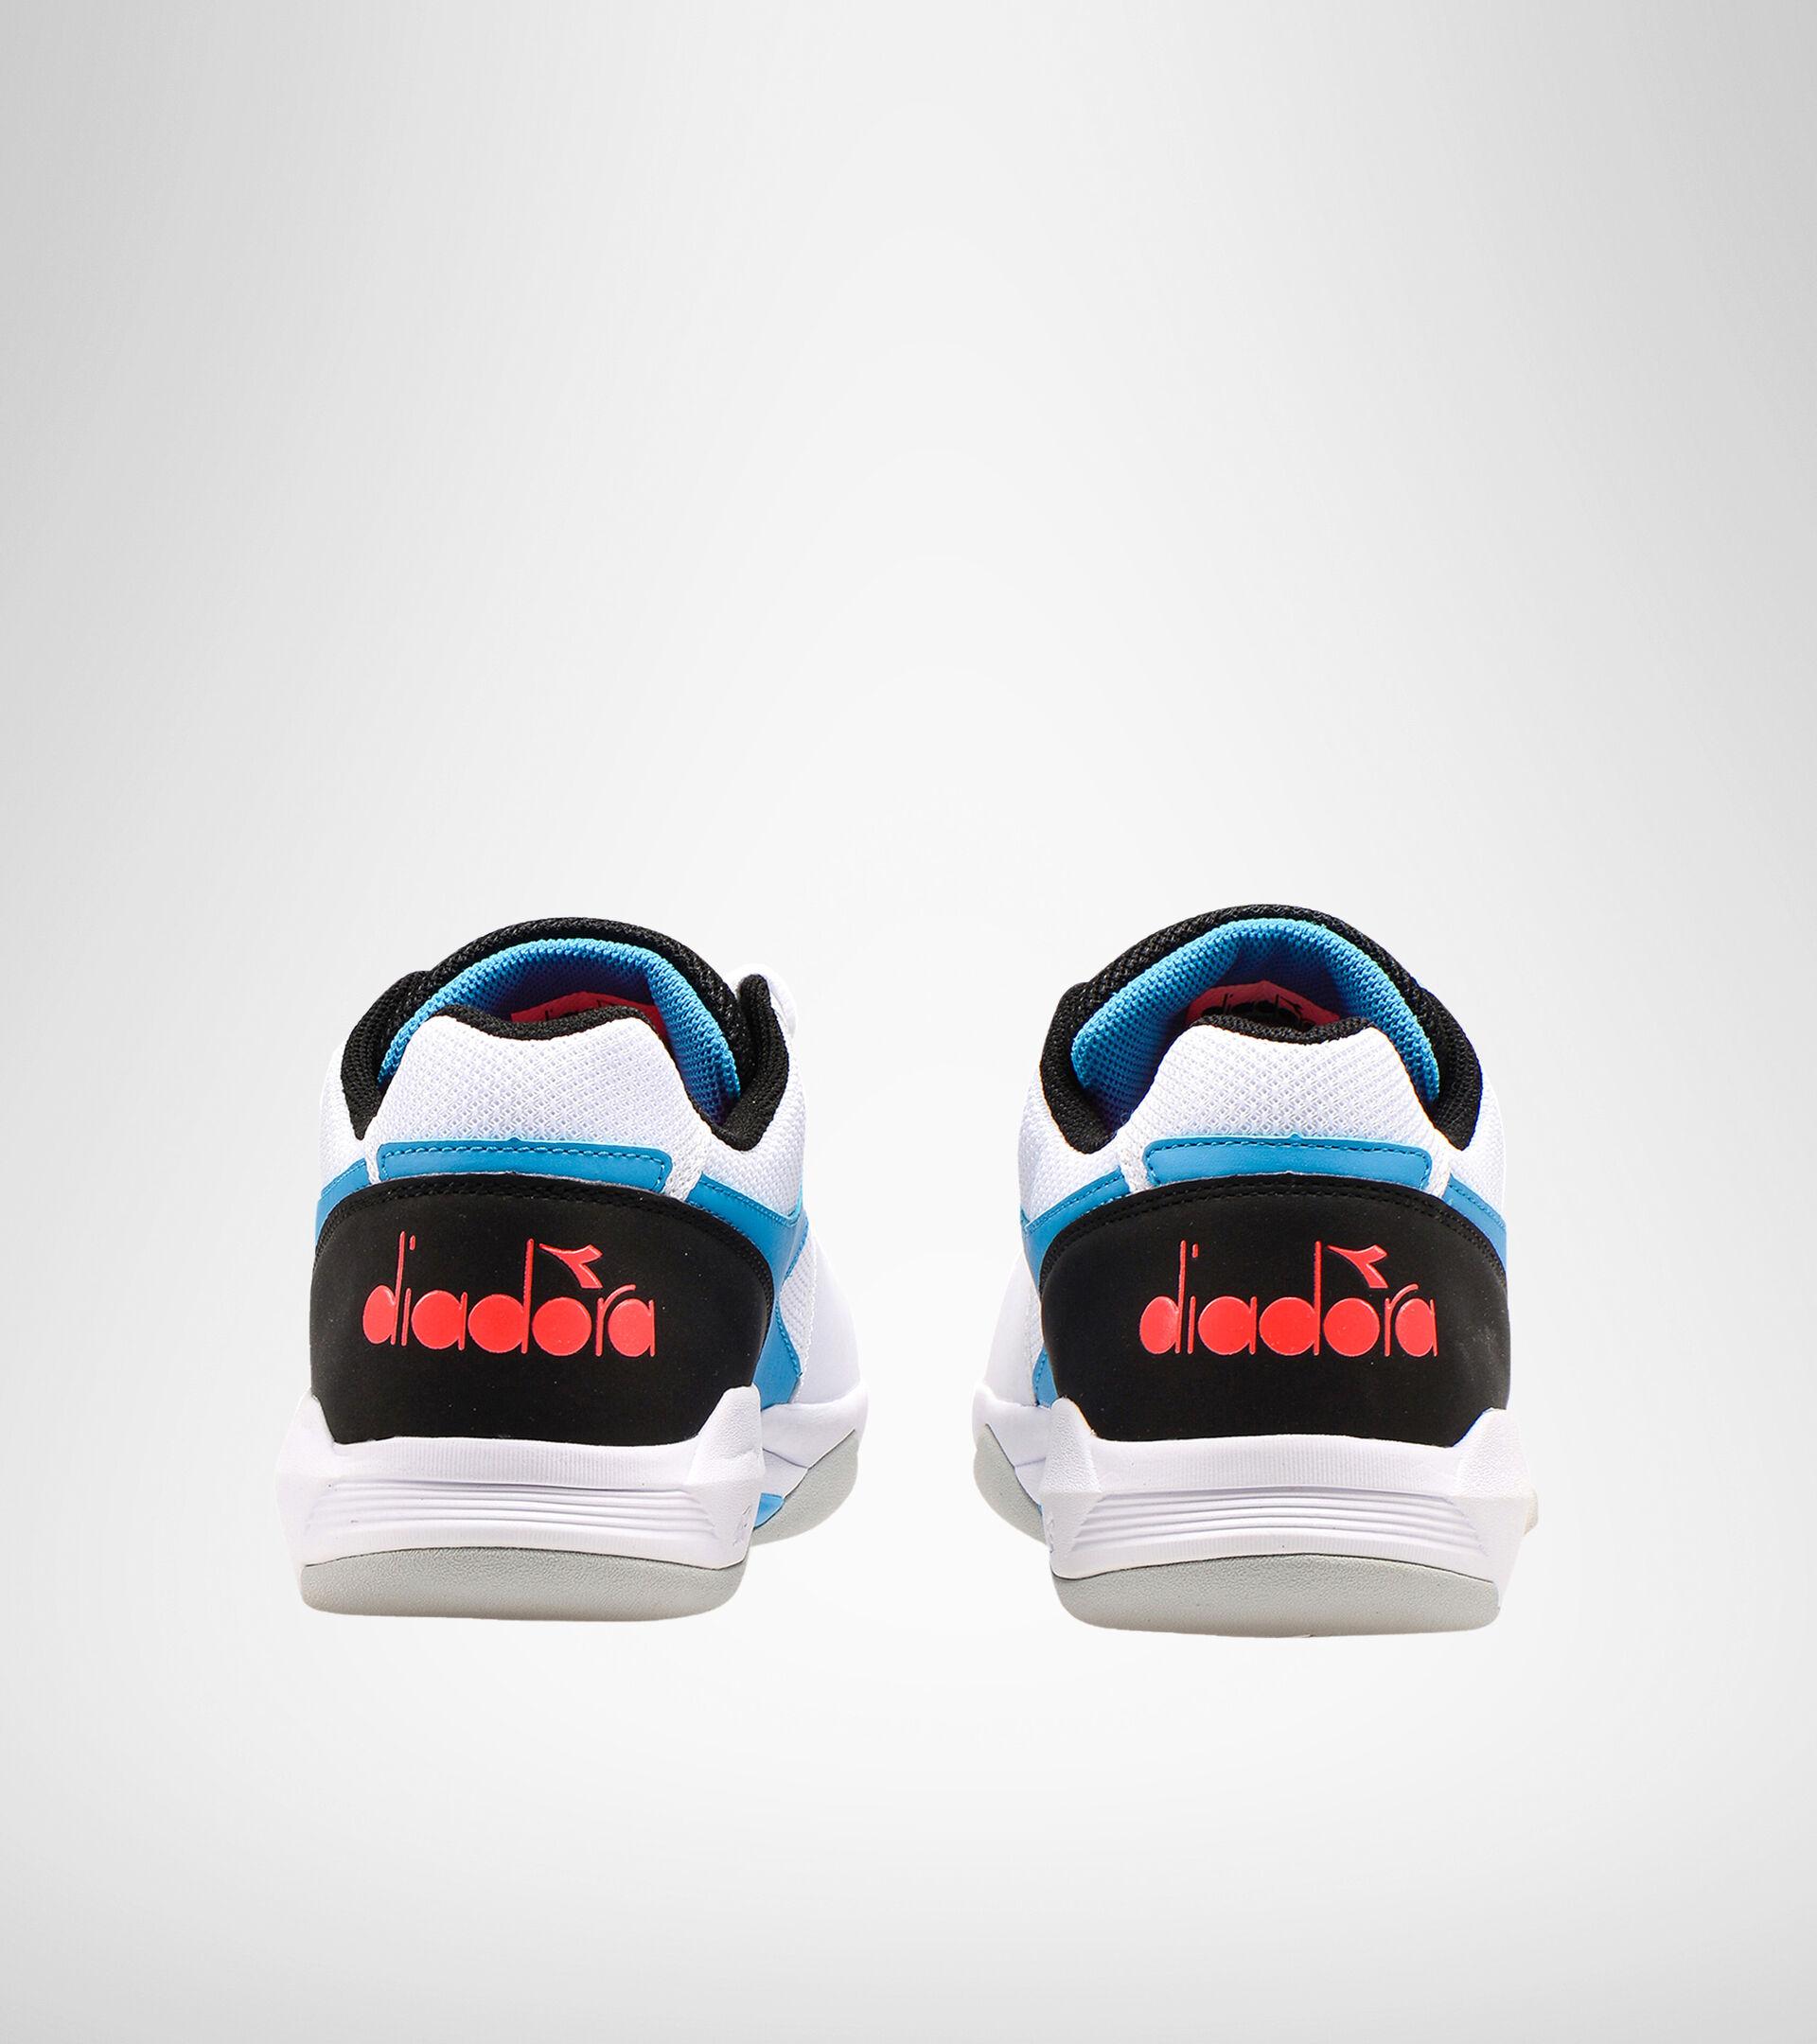 Indoor synthetic court tennis shoe - Unisex S.CHALLENGE 3 CARPET WHITE/BLUE FLUO - Diadora